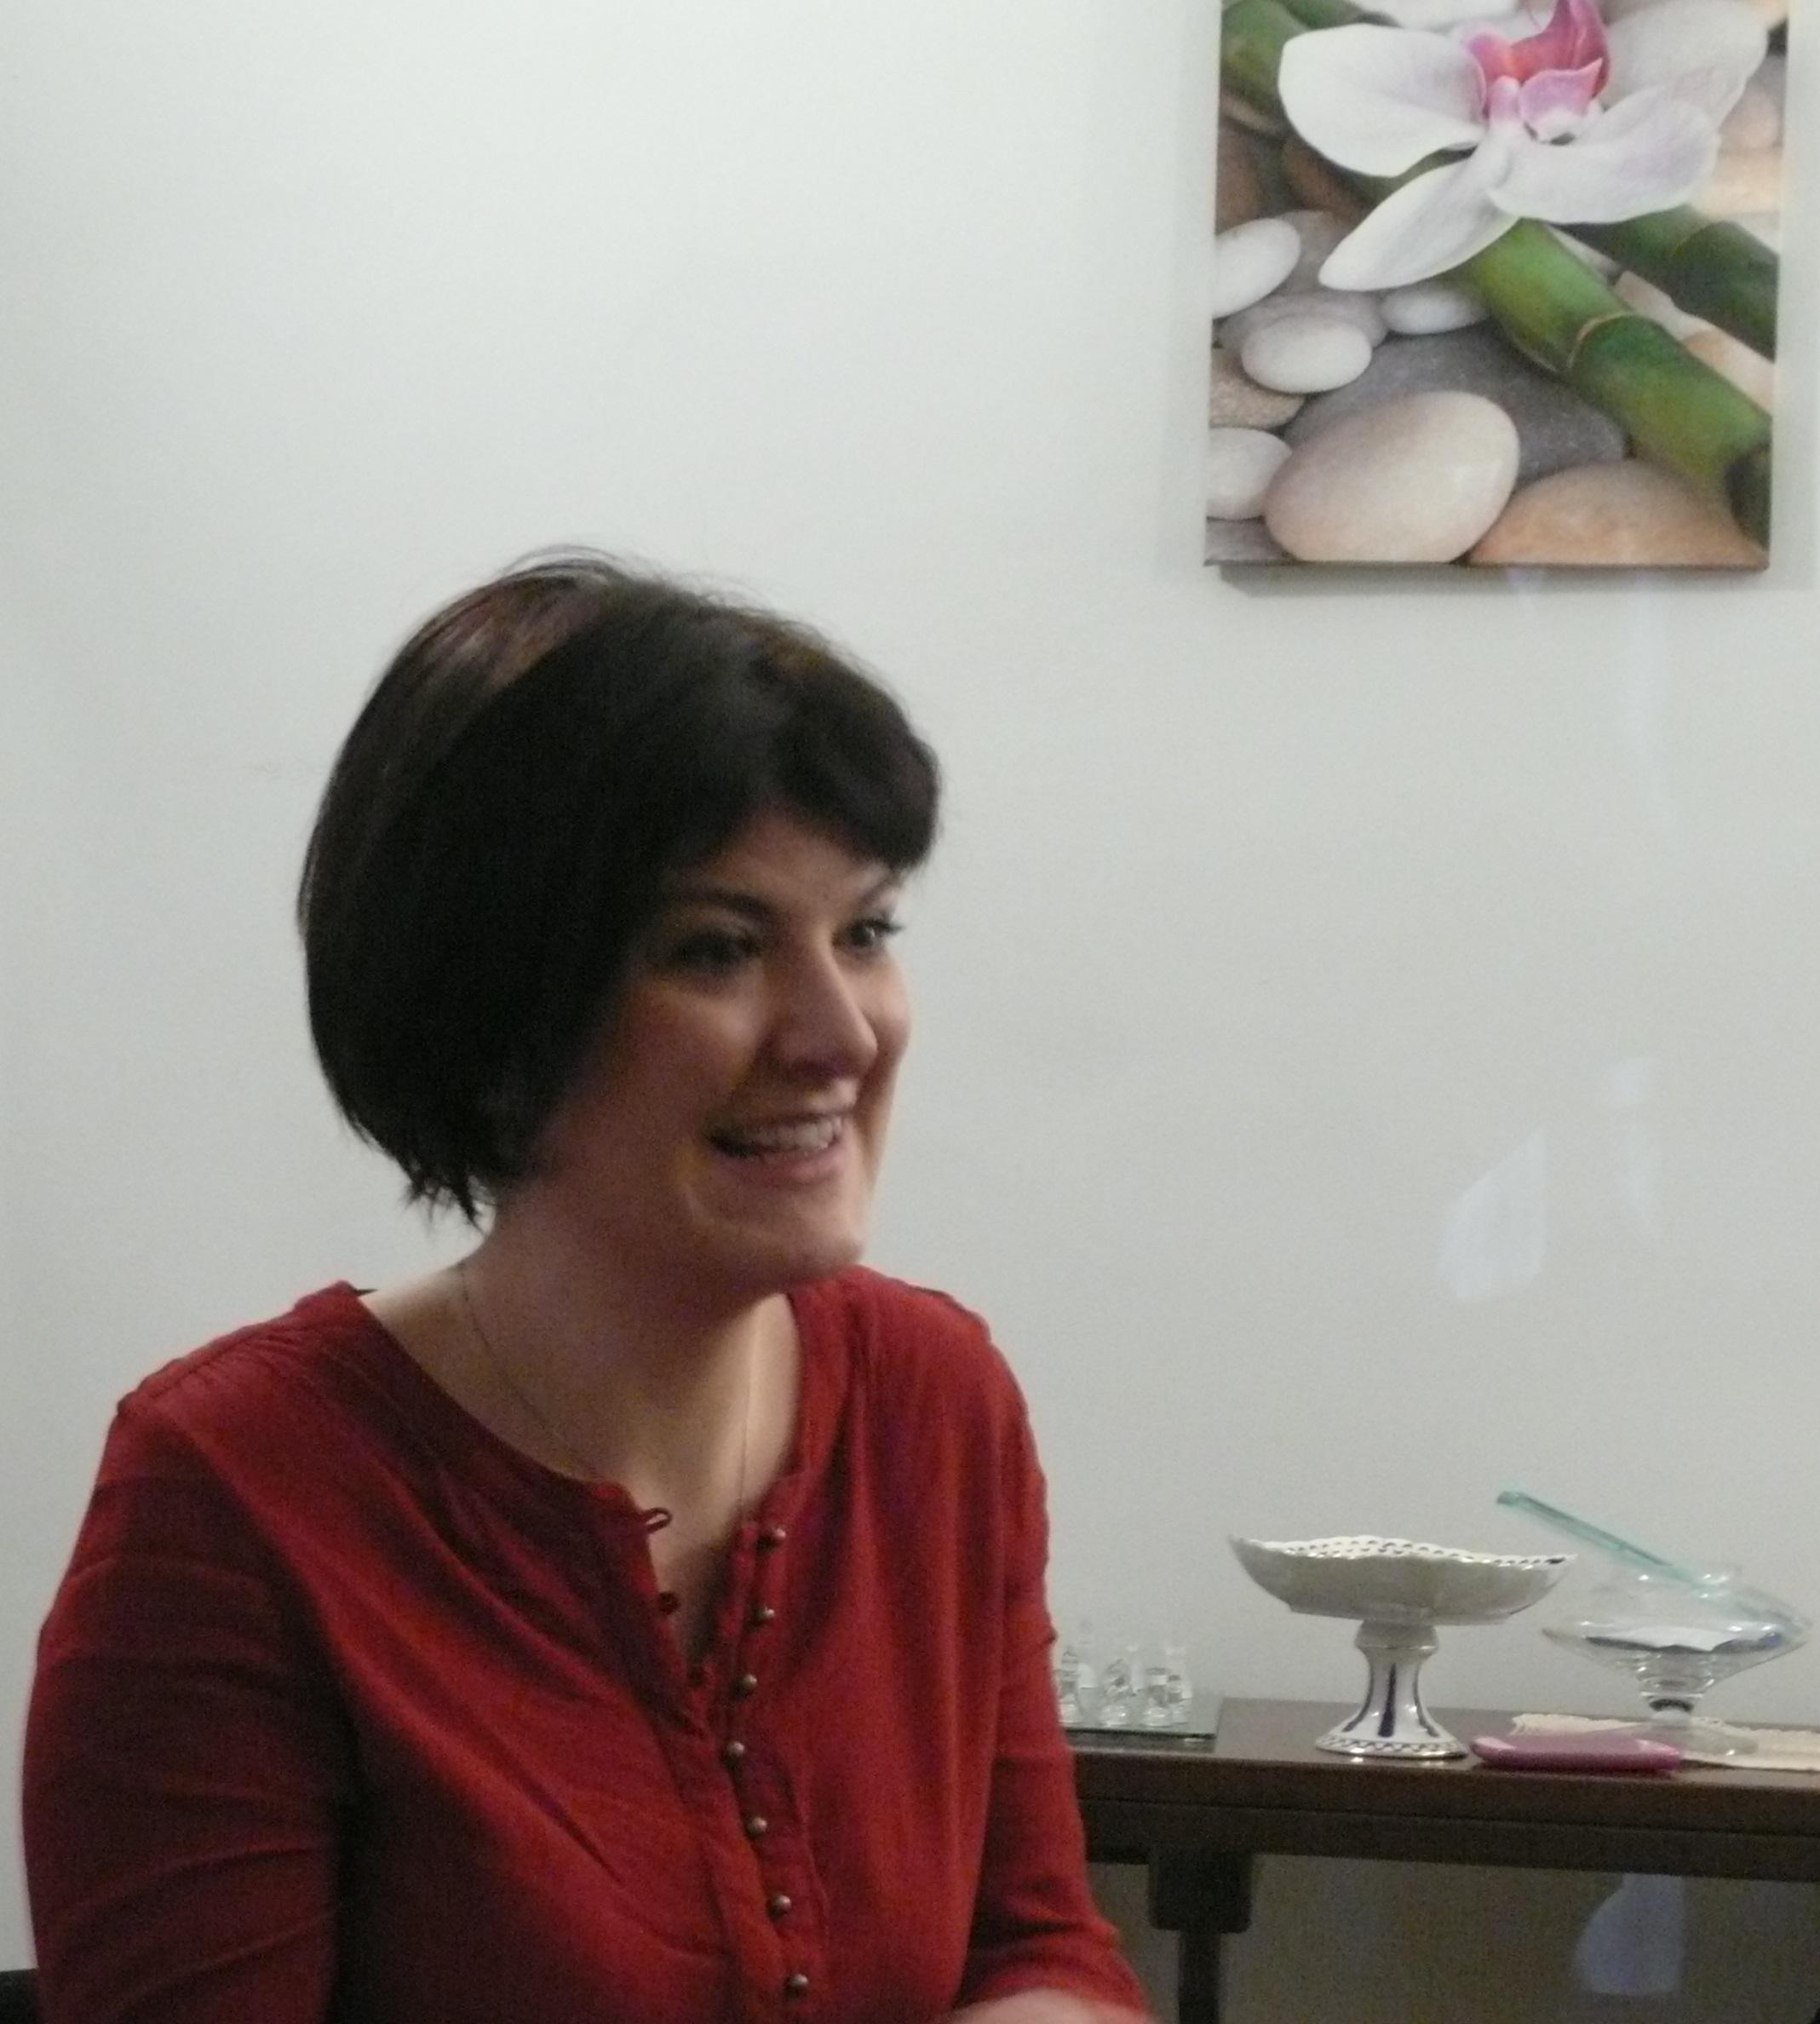 Sabrina Audisio psicoterapeuta a Torino